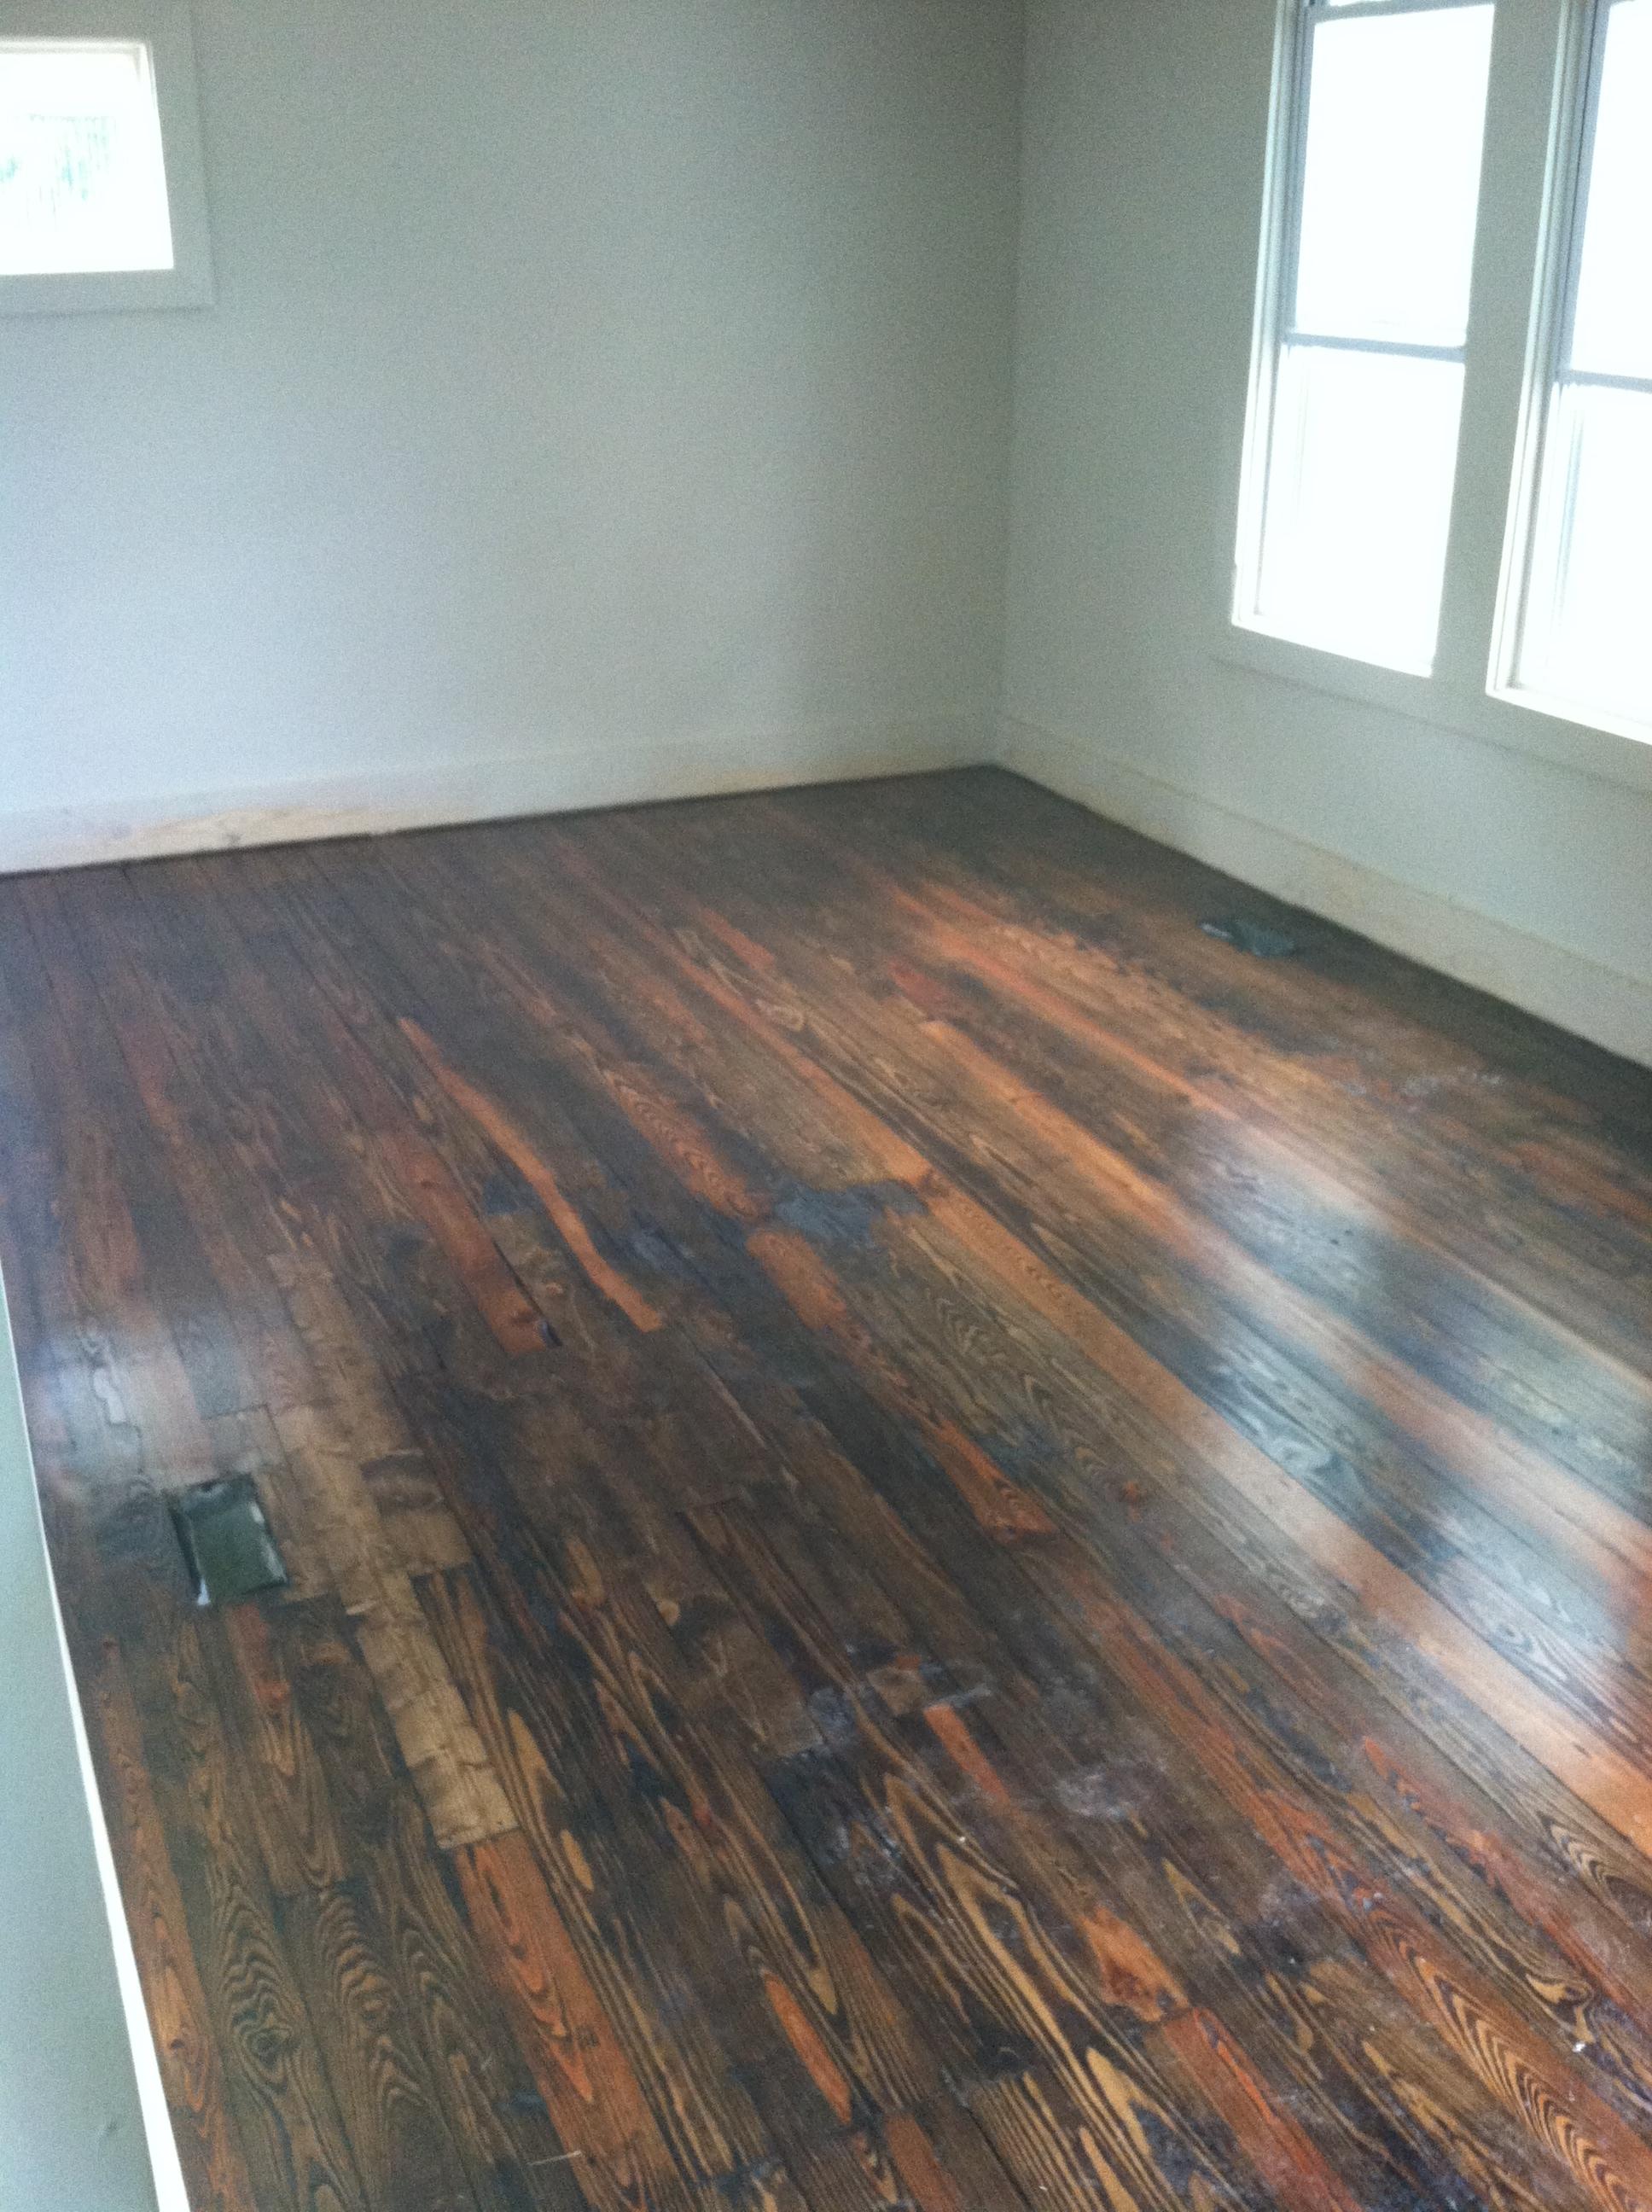 How To Sand And Refinish Pine Flooring  Carpet Vidalondon